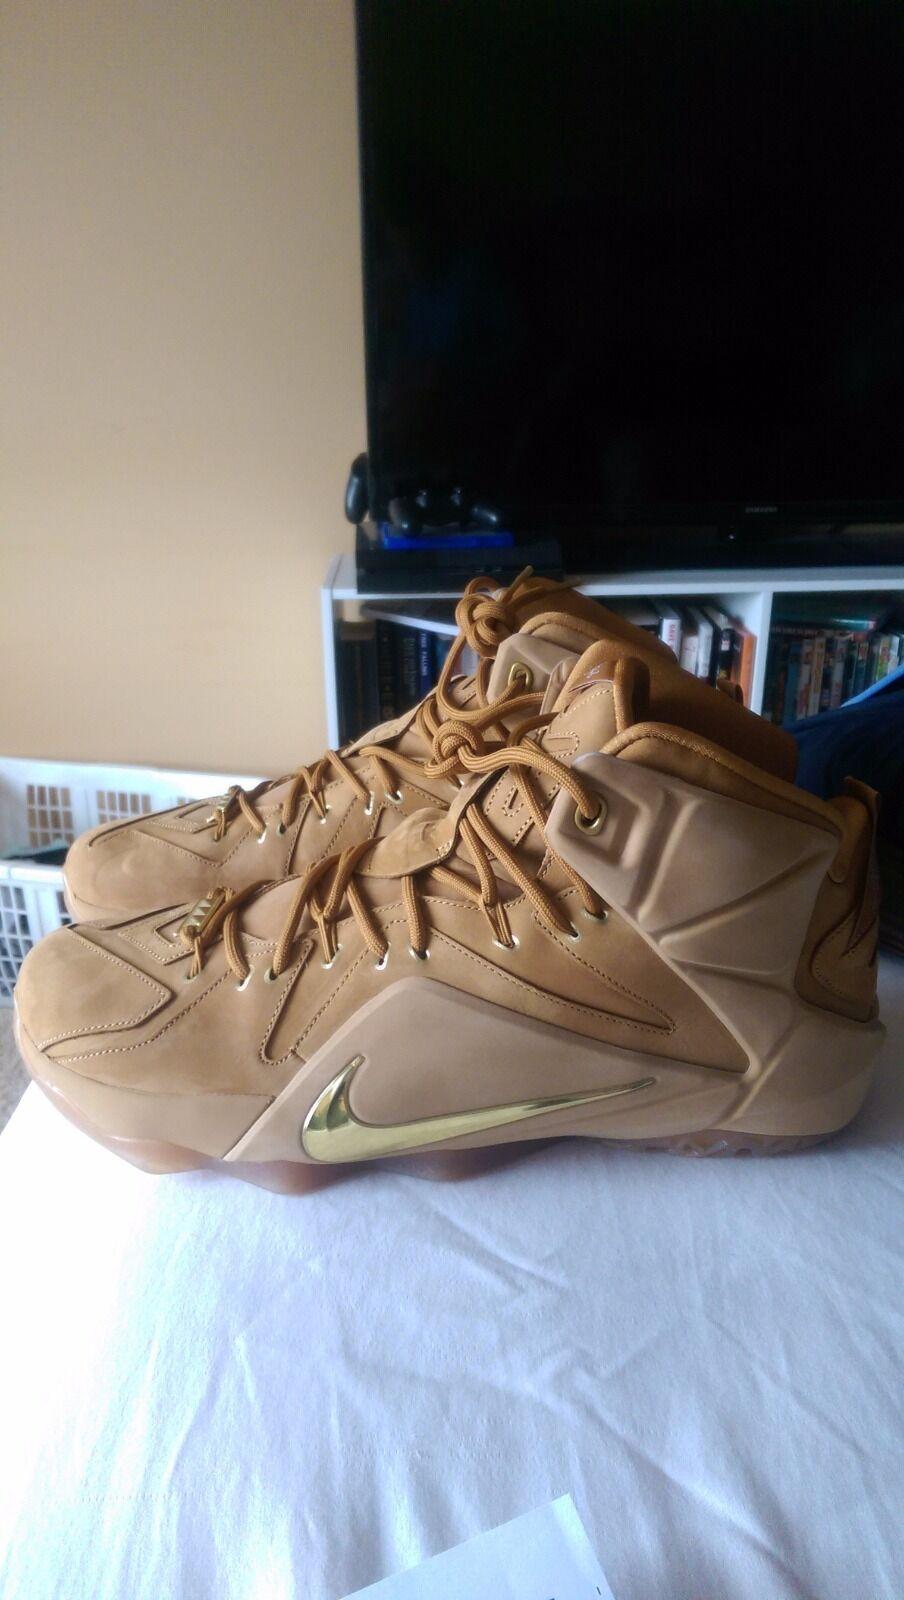 Nike LeBron 12 XII EXT QS Wheat Metallic Gold Cavs Nubuck New Men's Size: 13